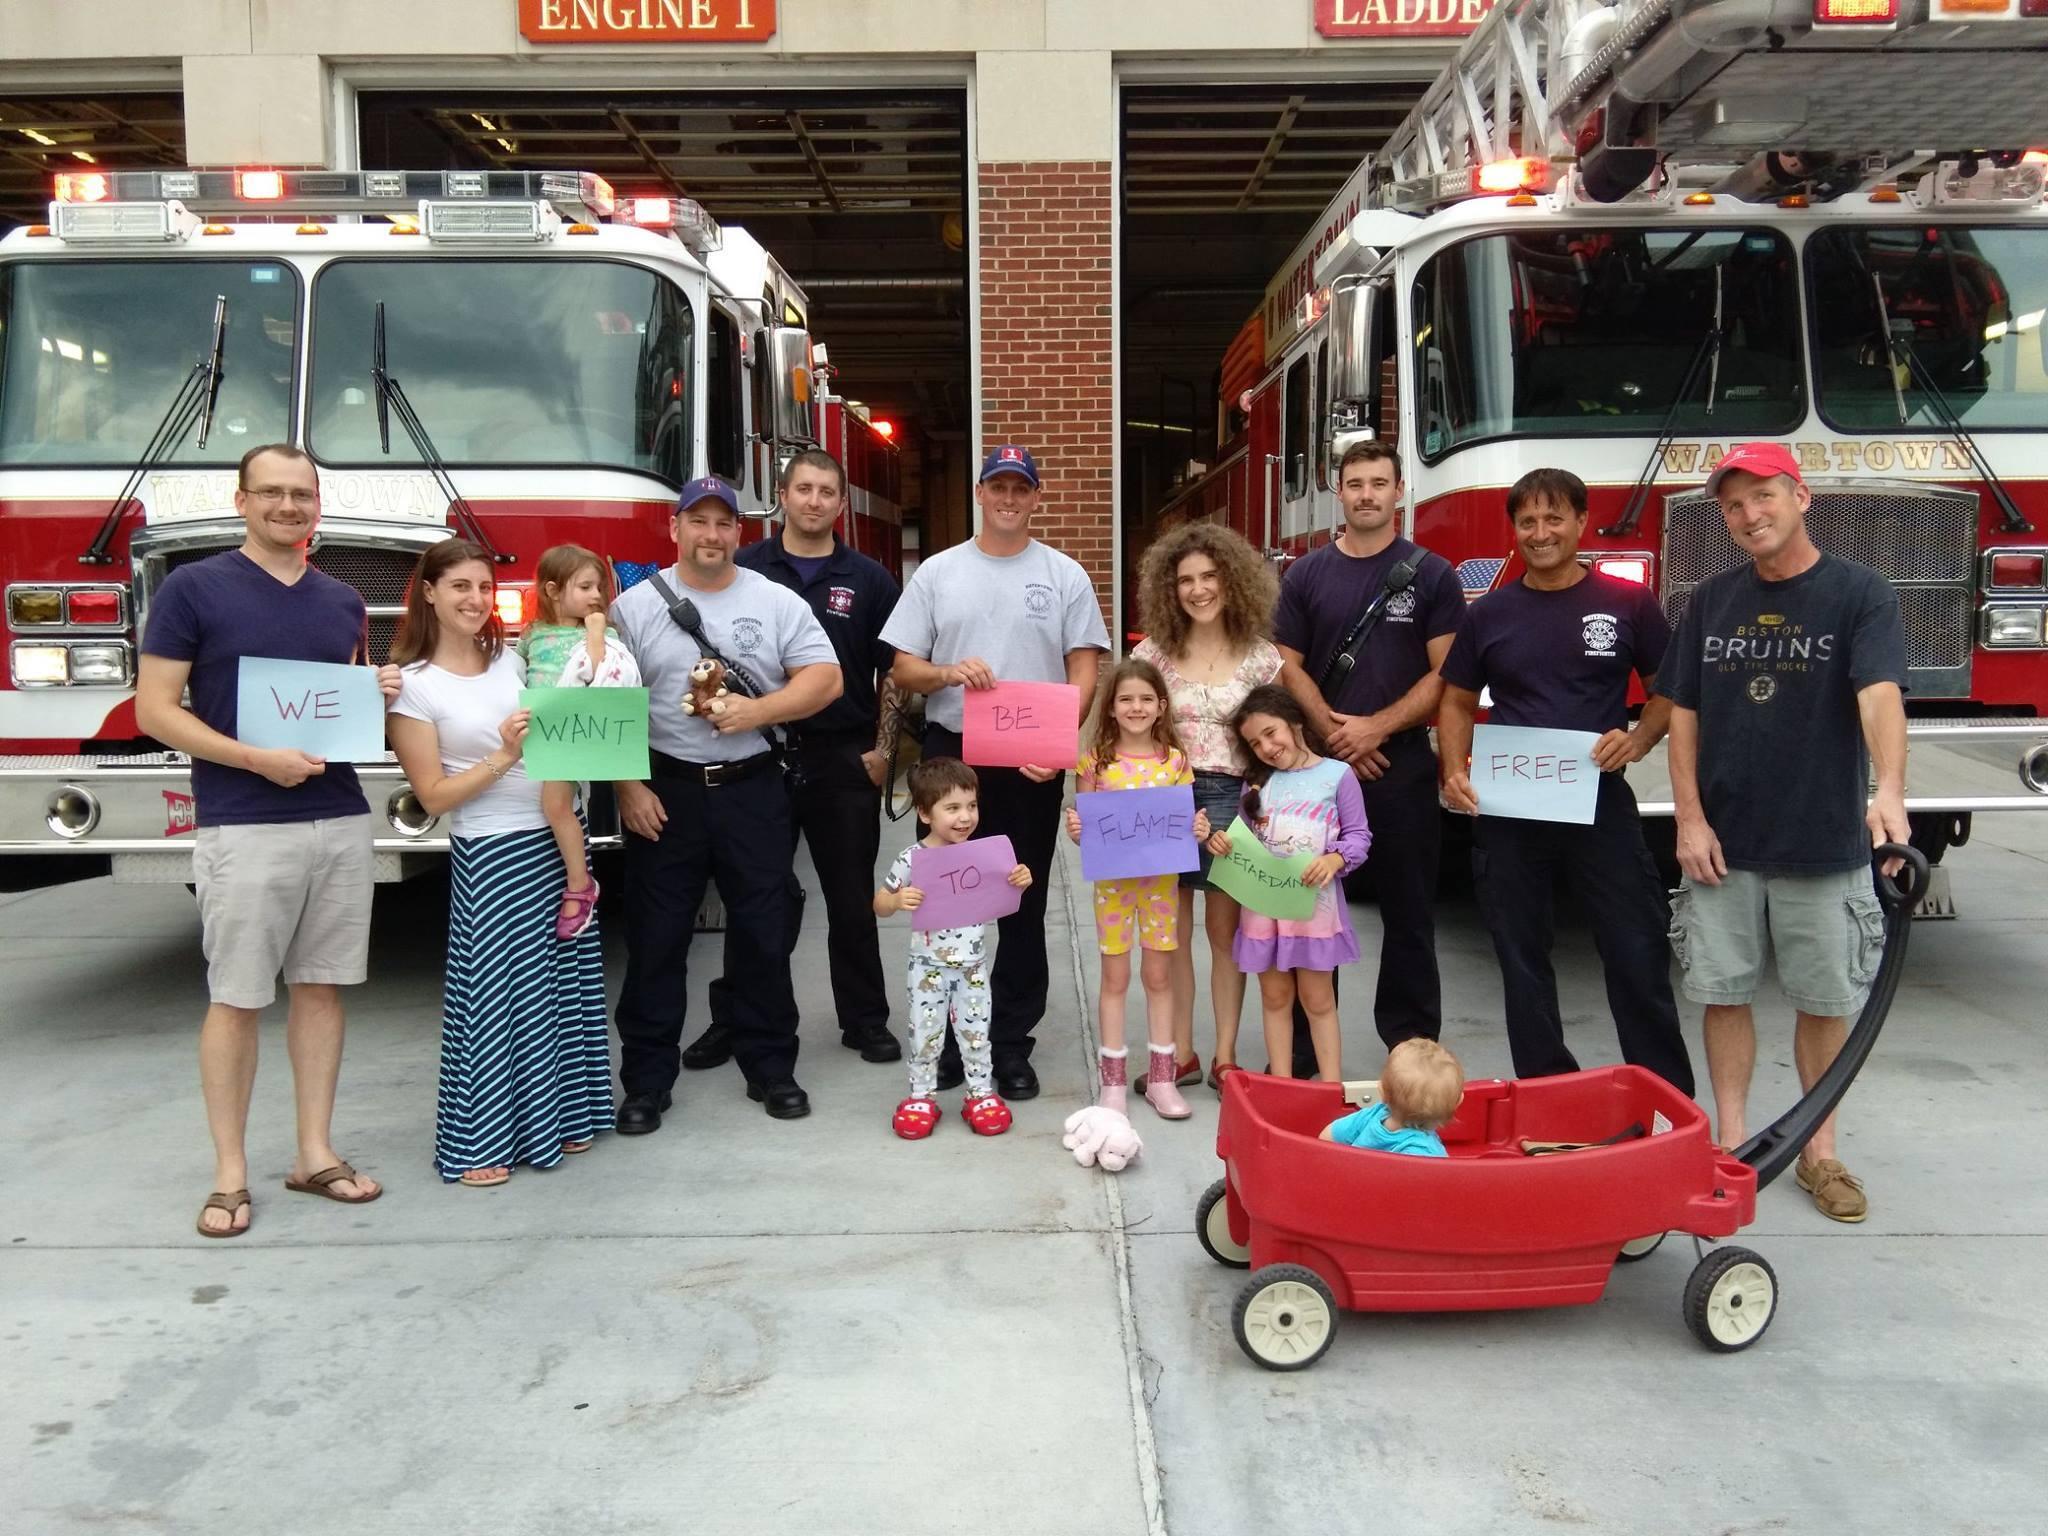 Watertown firefighters